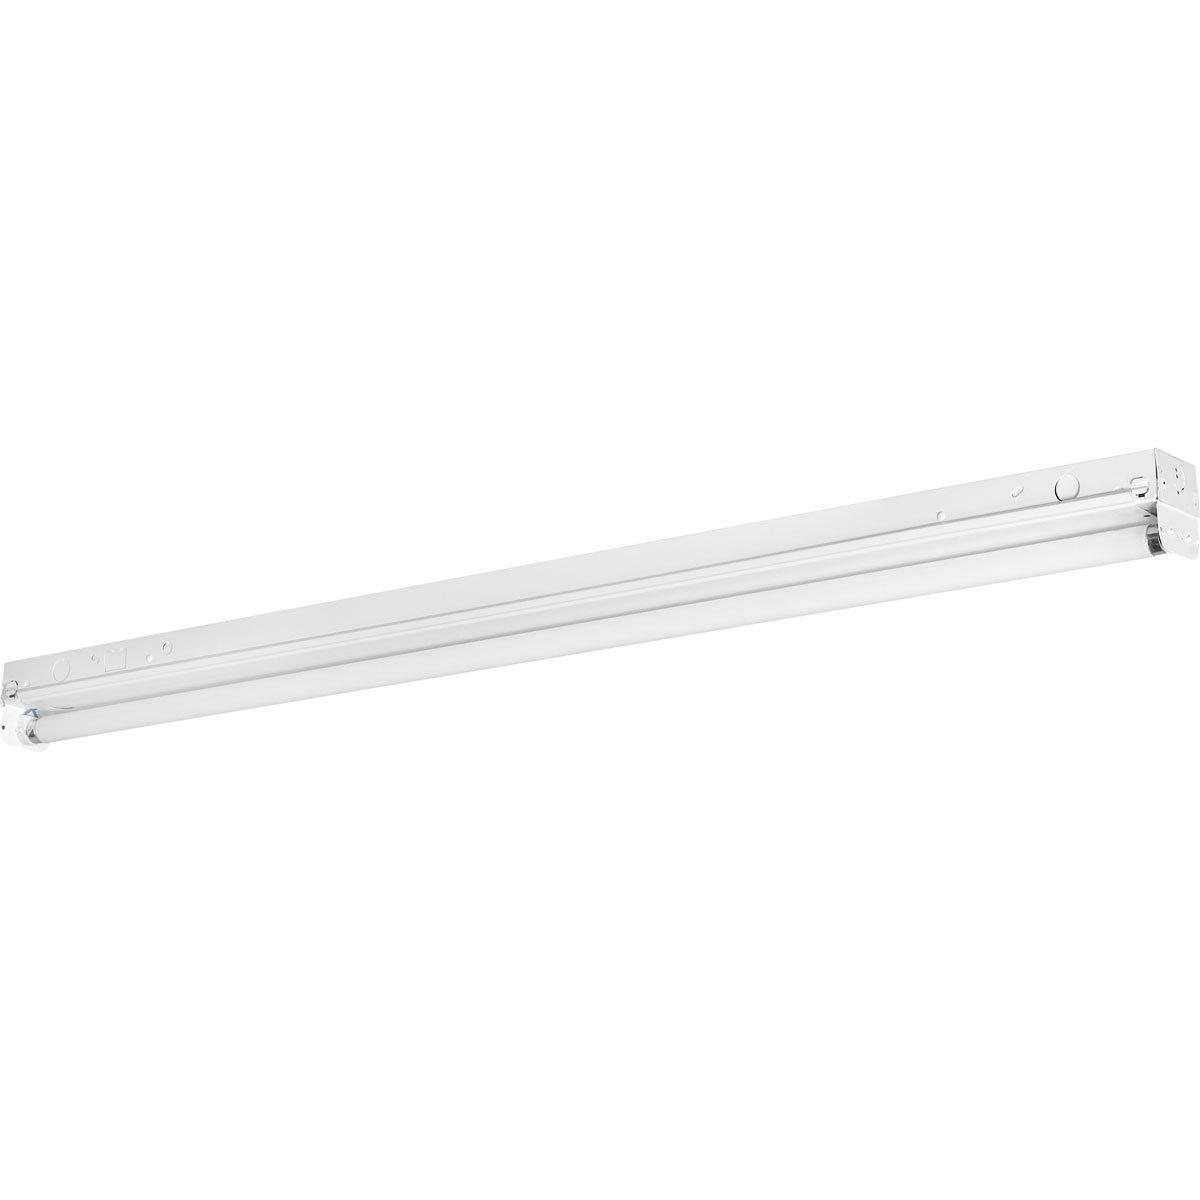 Progress Lighting P7267-30EB Fluorescent Strip Lights 120 Volt Normal Power Factor Electronic Ballast, White